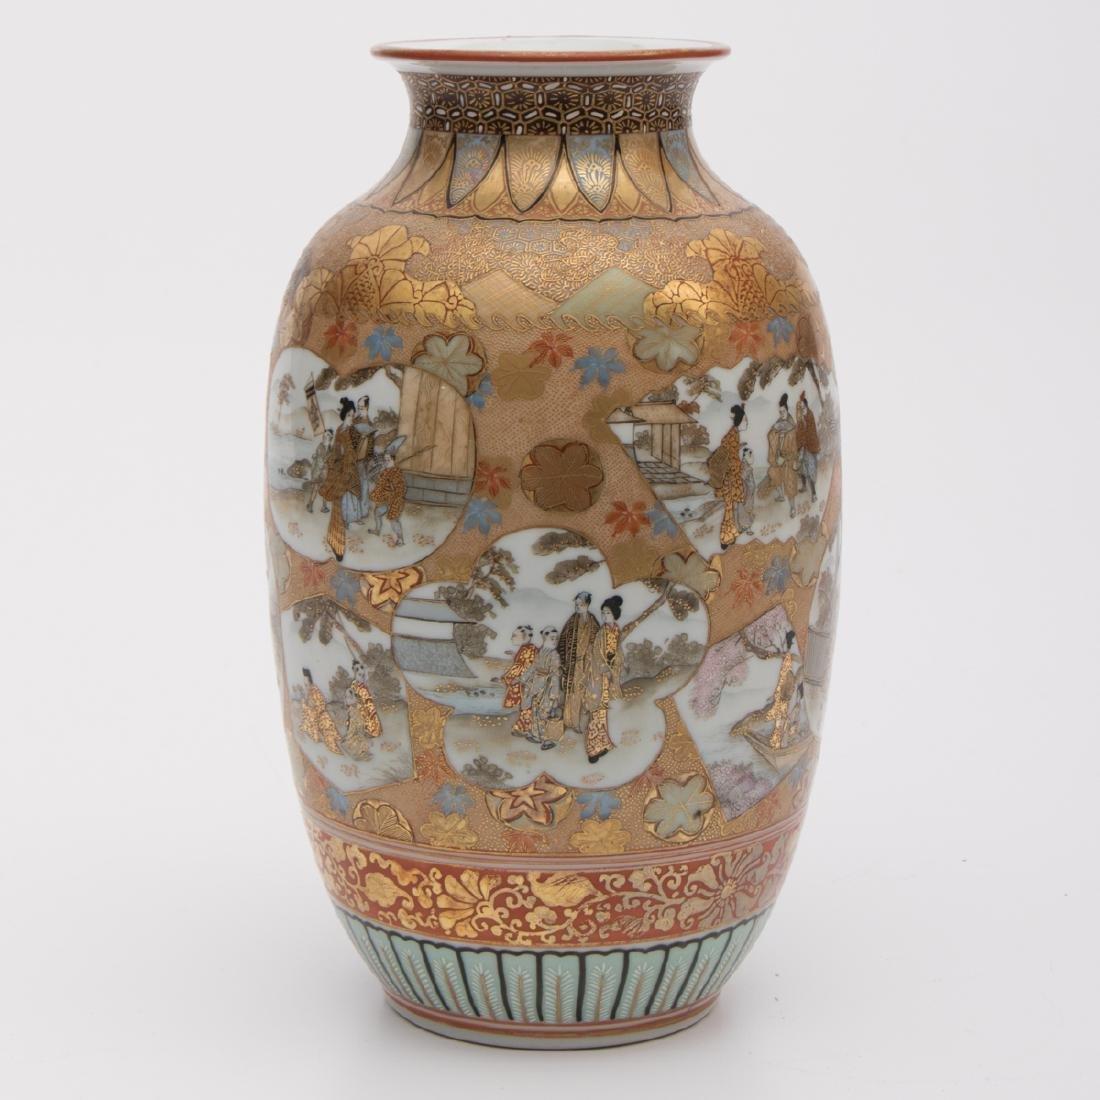 A Japanese Satsuma Porcelain Vase, 19th/20th Century. - 2